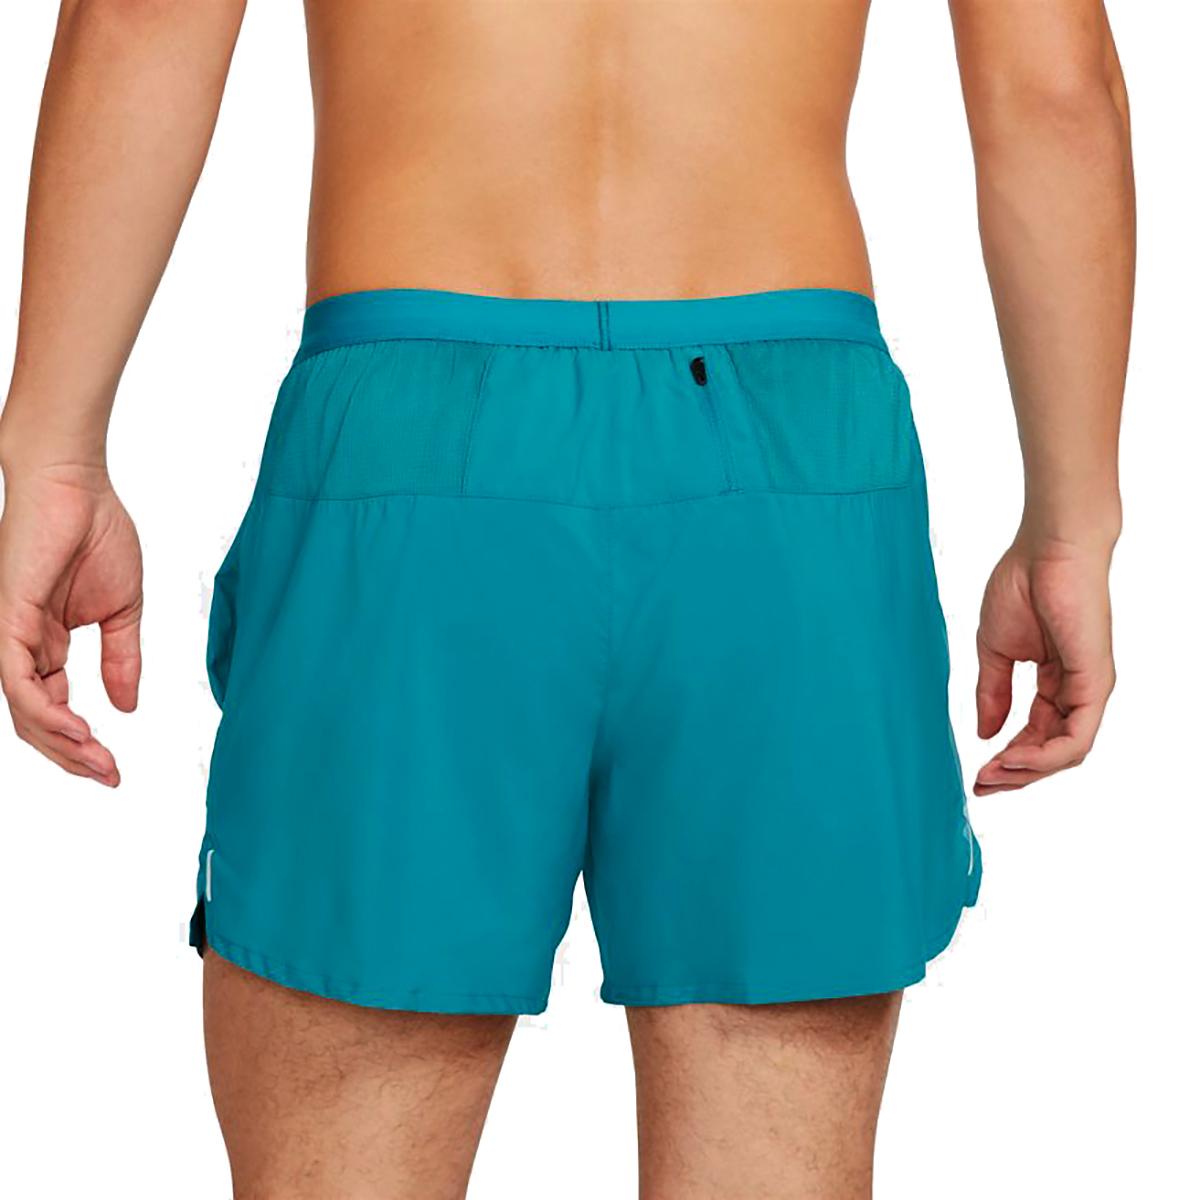 "Men's Nike Flex Stride 5"" Brief Running Shorts, , large, image 2"